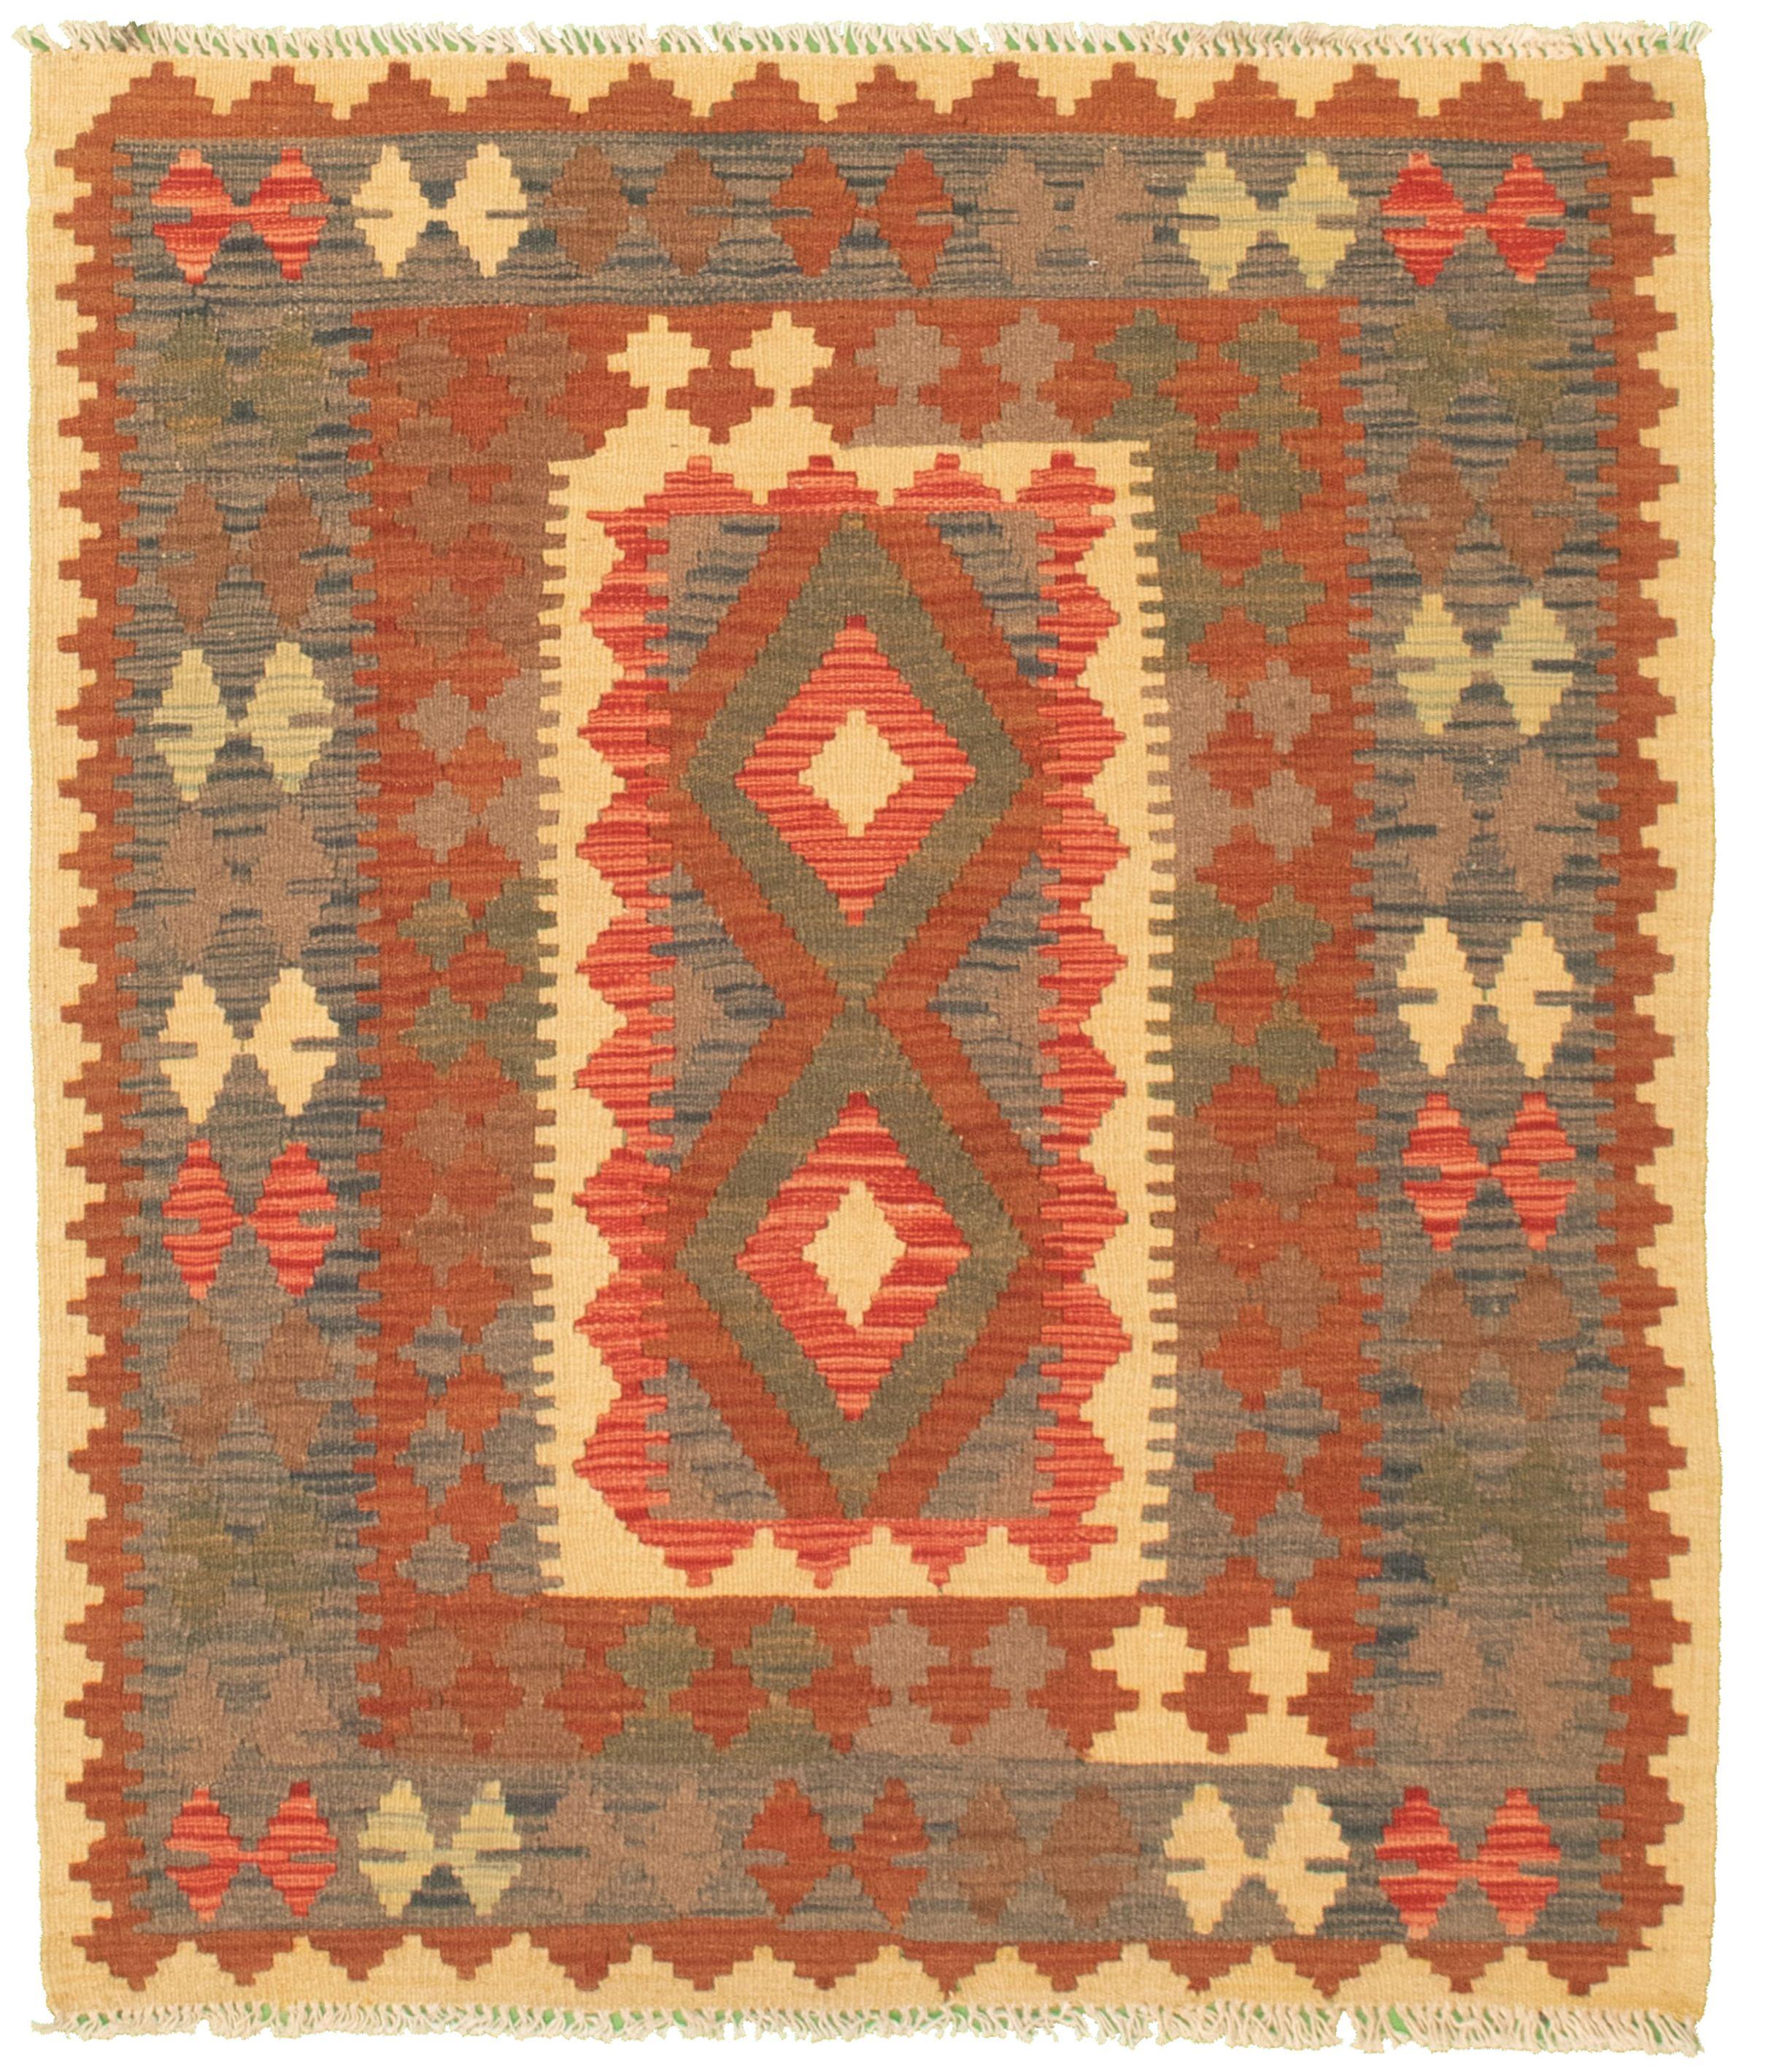 "Hand woven Kashkoli FW Dark Brown, Red Cotton Kilim 3'4"" x 4'0"" Size: 3'4"" x 4'0"""